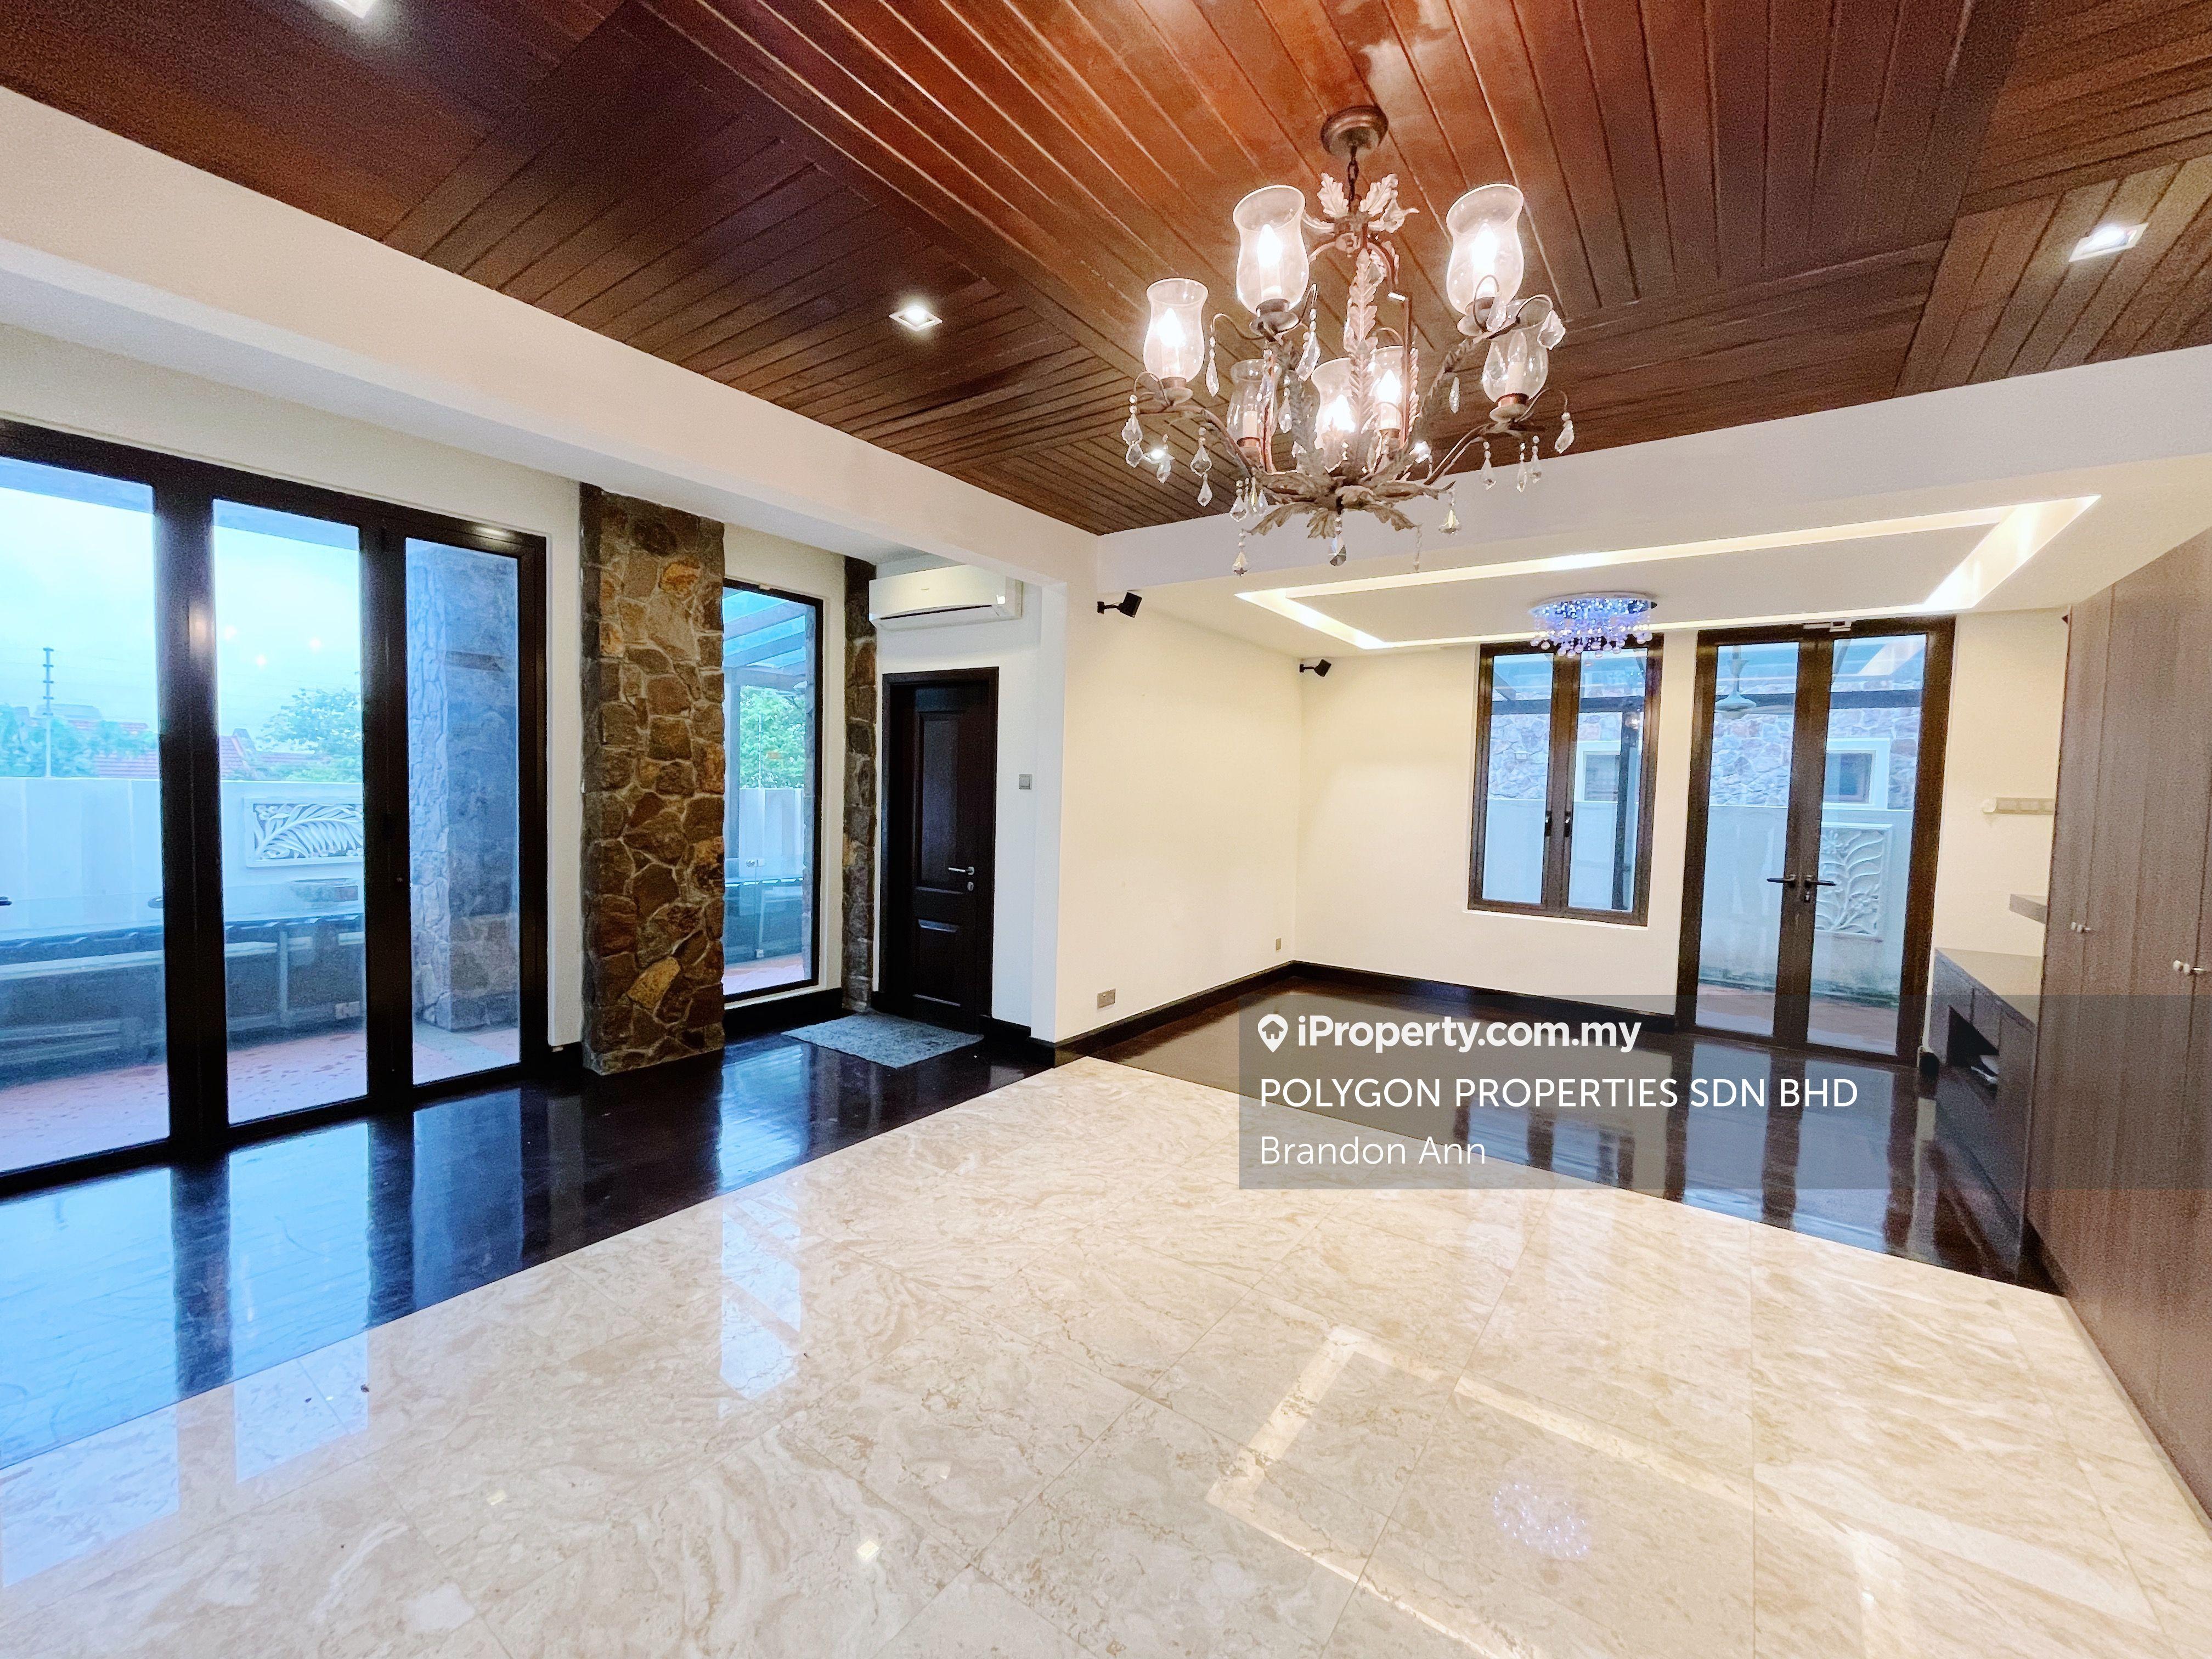 TTDI, Ttdi Hills, Taman Tun Dr Ismail,Kuala Lumpur, Taman Tun Dr Ismail